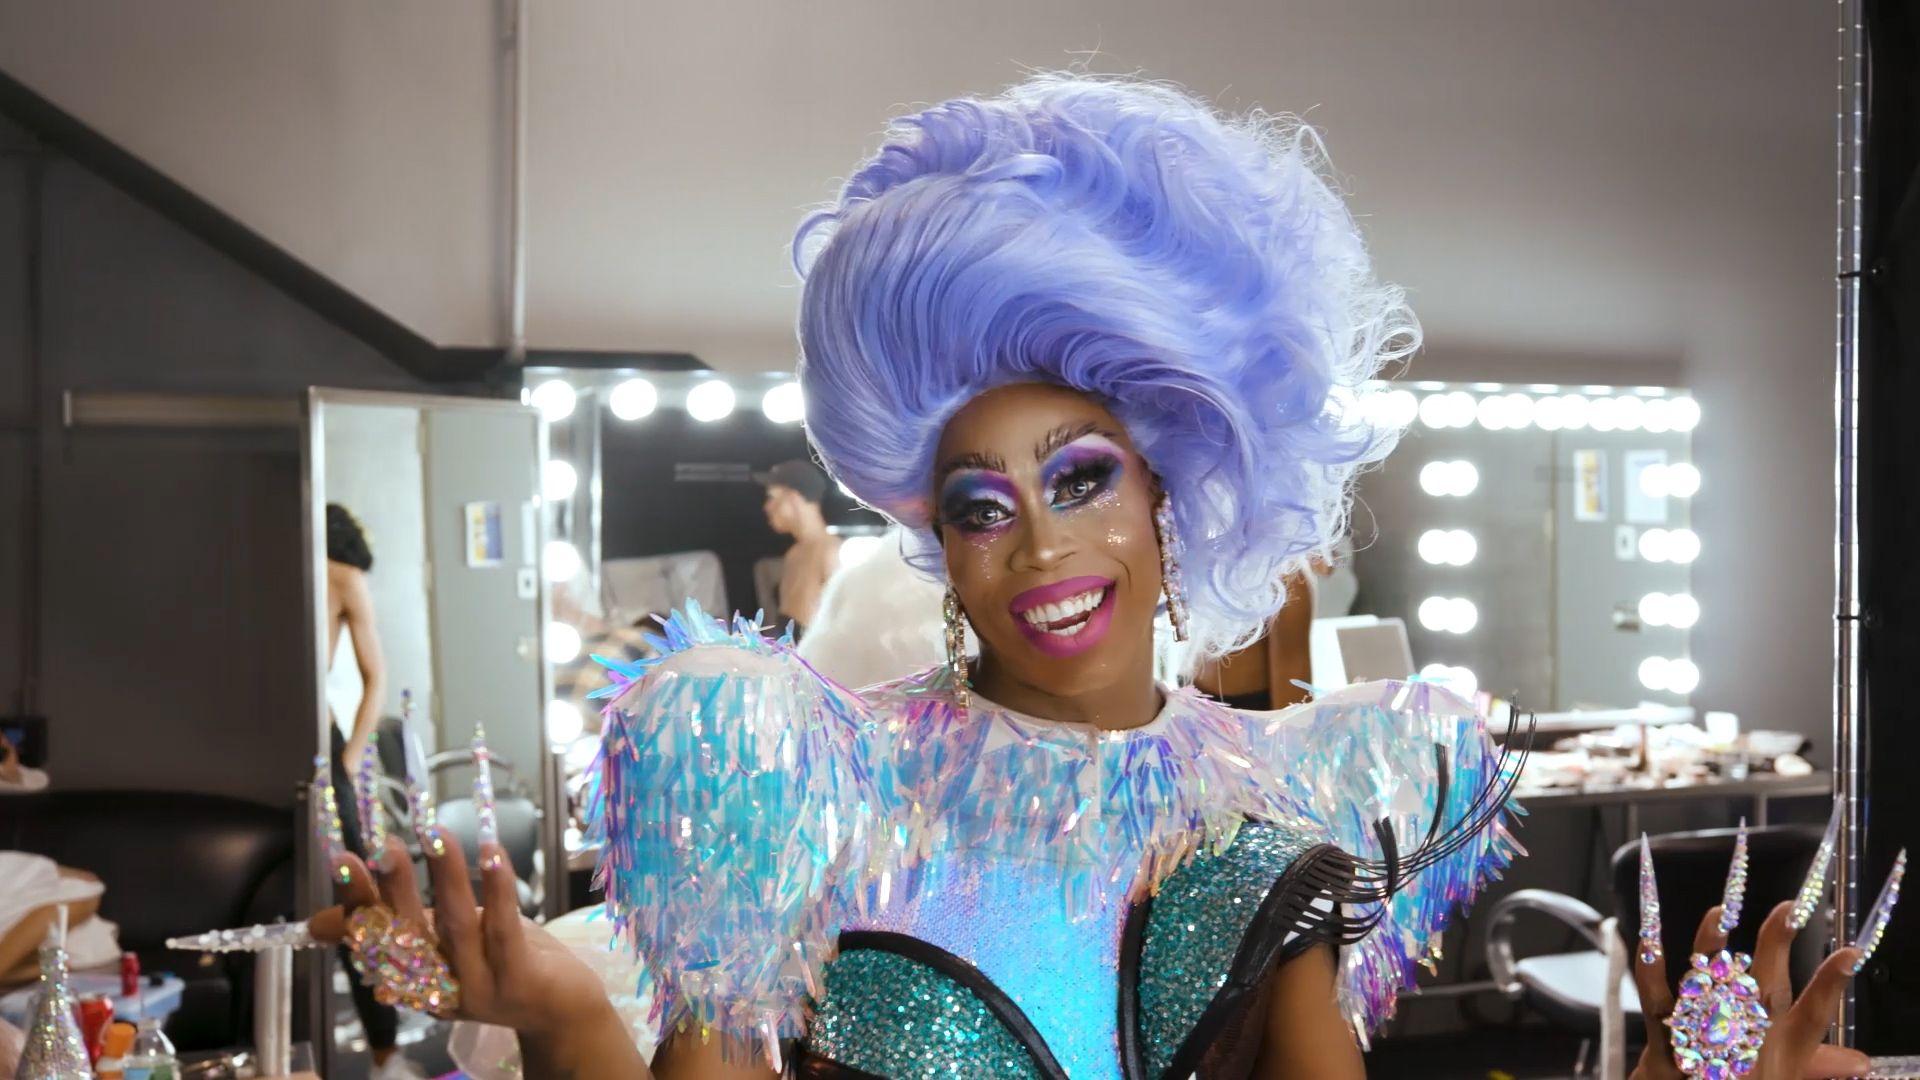 Terms Of Use >> Exclusive - A Behind-the-Scenes Peek at RuPaul's Drag Race All Stars Season 4 - RuPaul's Drag ...